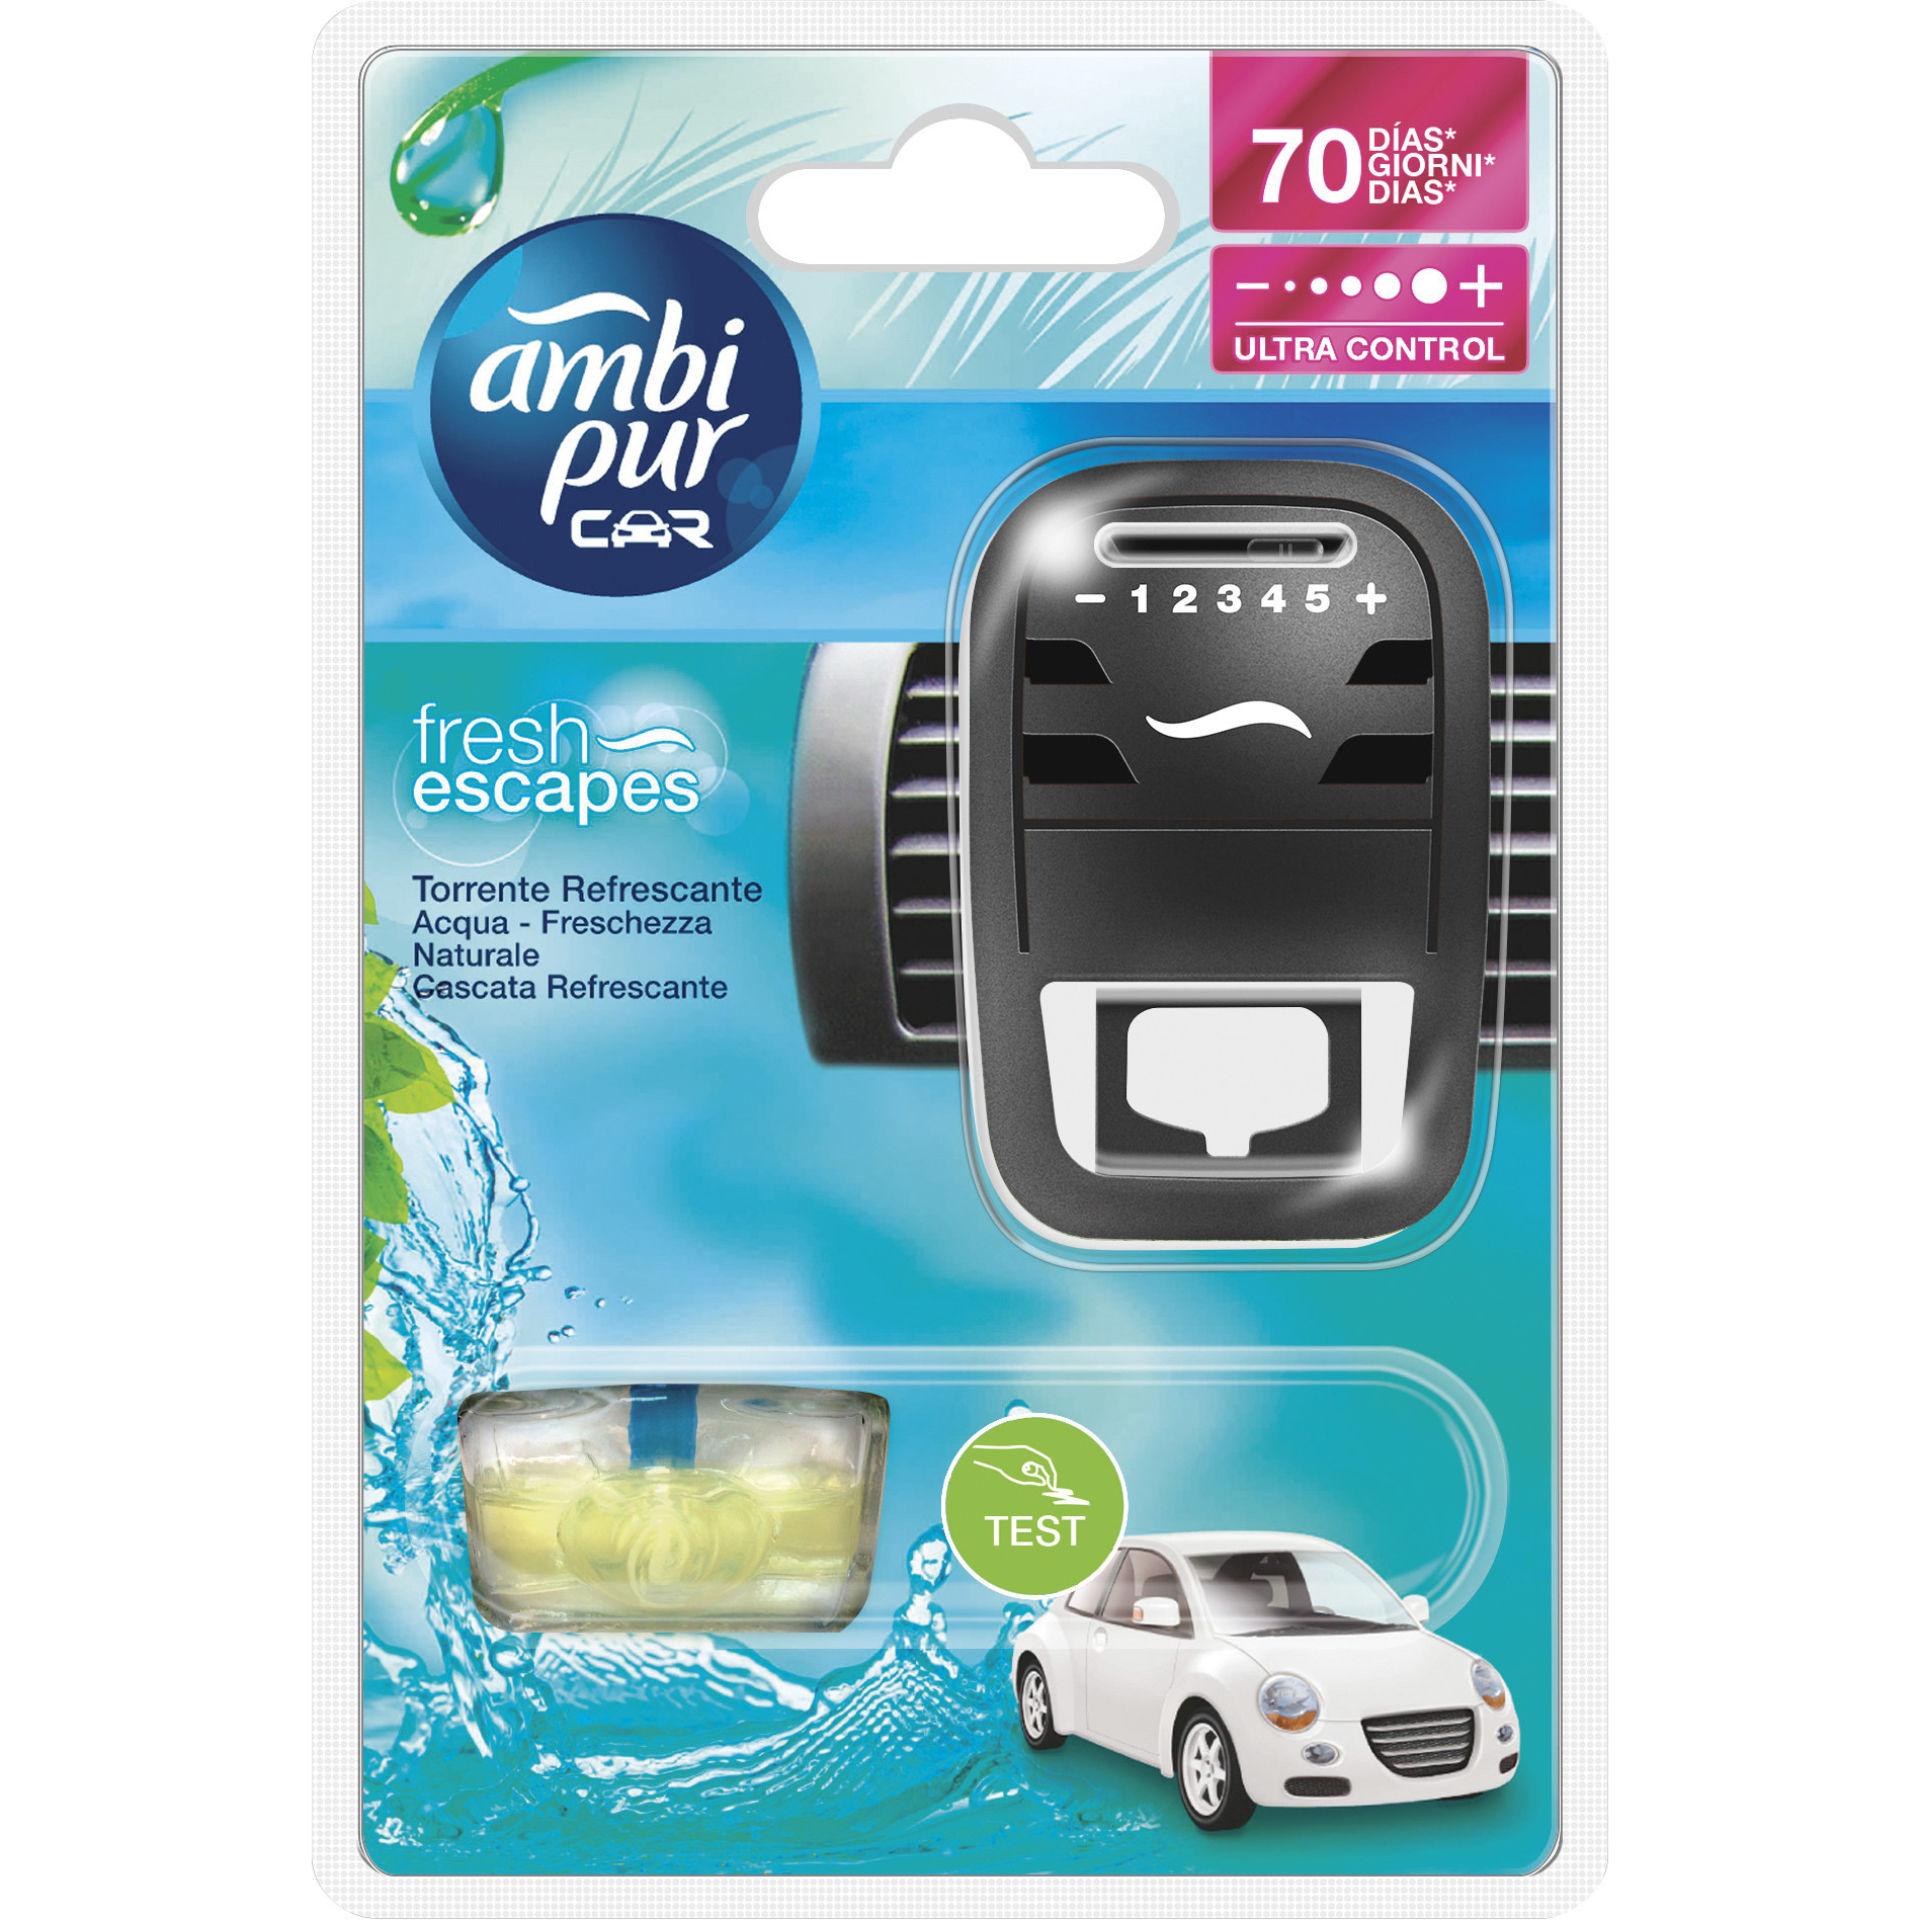 AMBIPUR CAR COMPLETO AQUA -9022-Ambipur